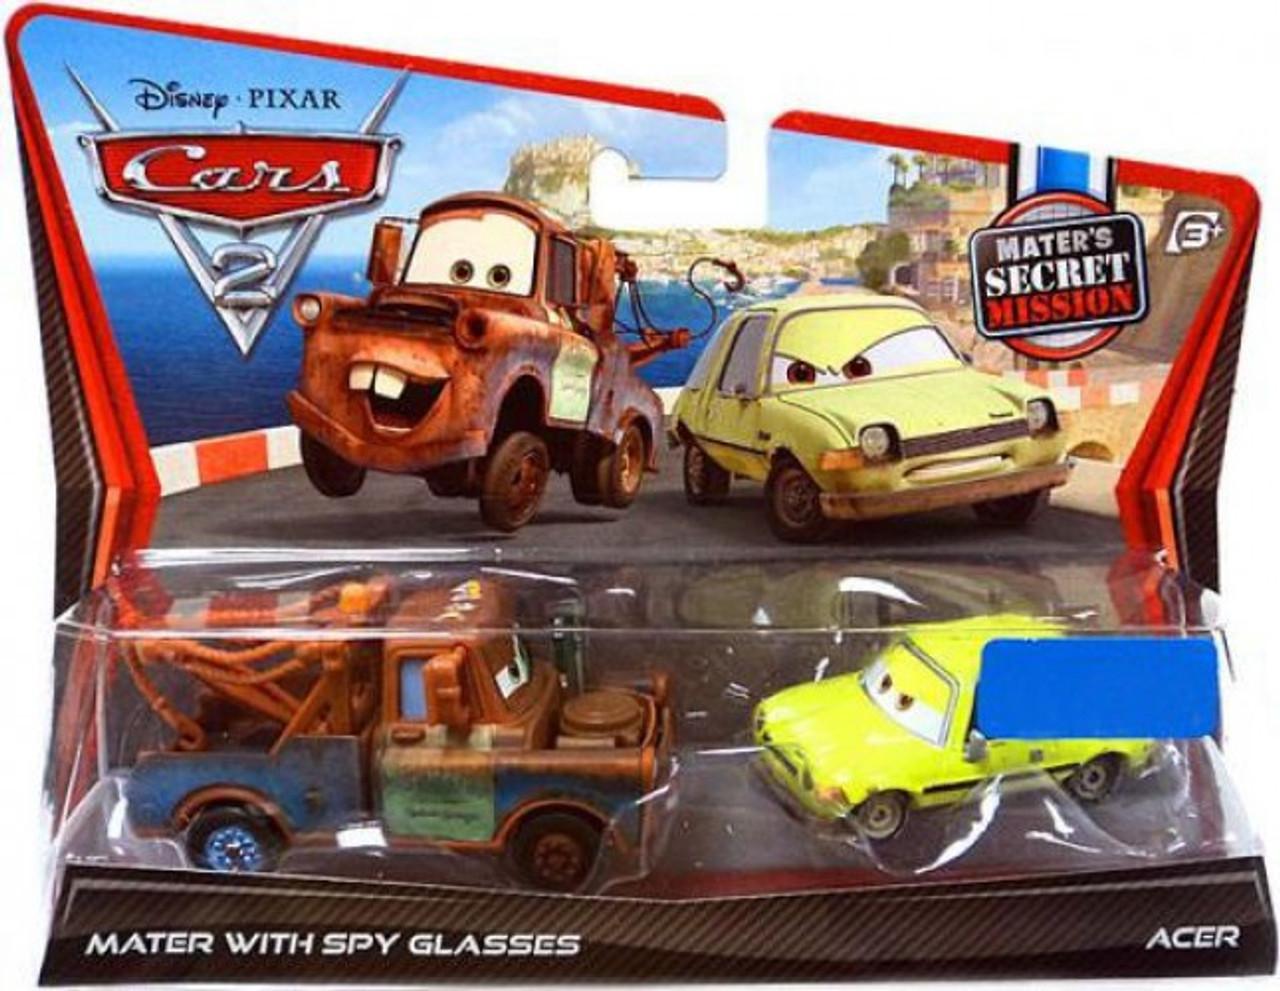 New In Box Disney Pixar Cars 2 Acer